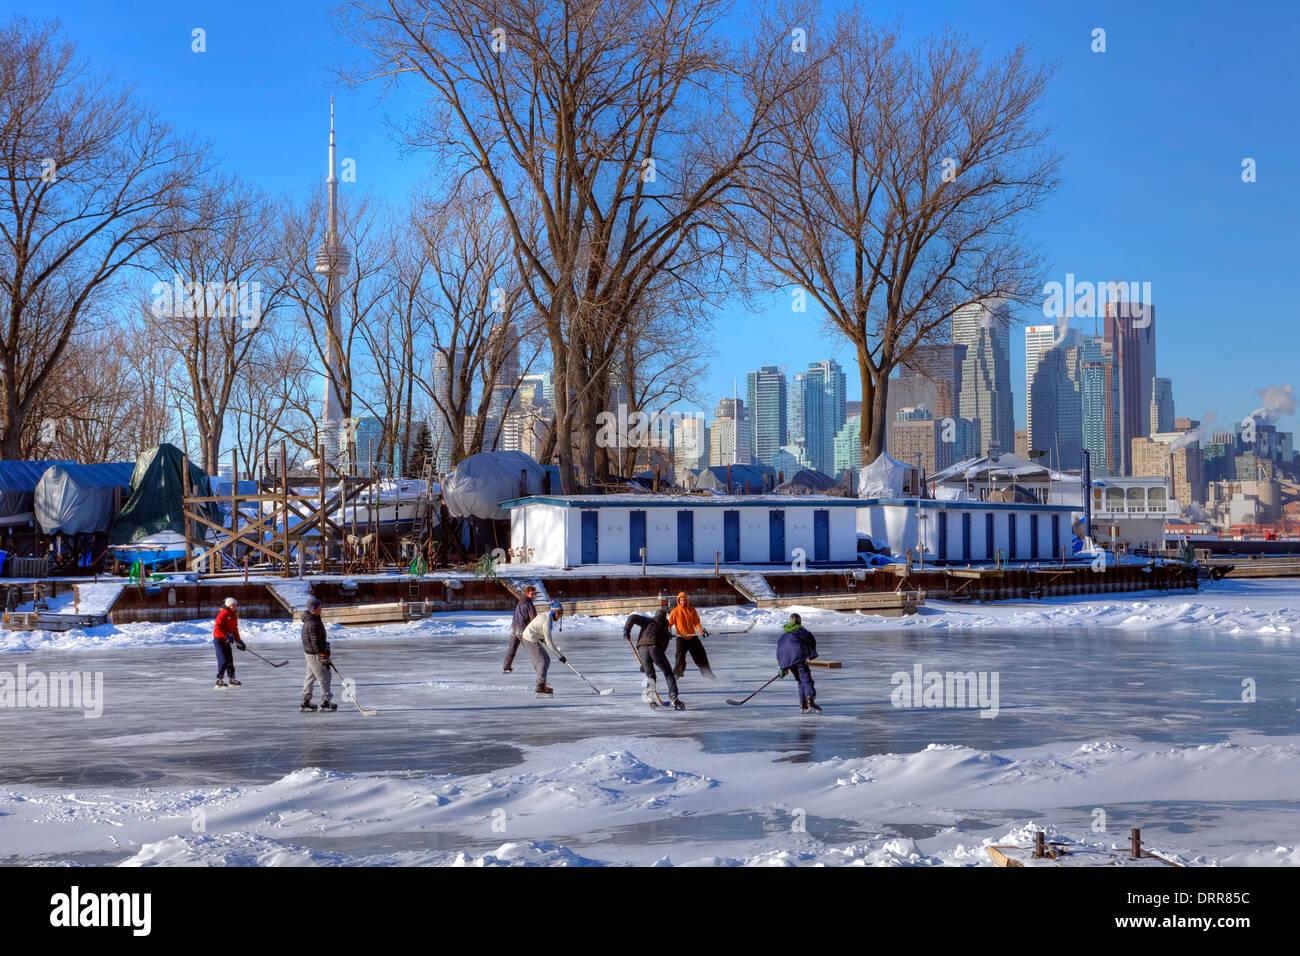 Le hockey sur glace, Toronto, Ontario, Canada Photo Stock